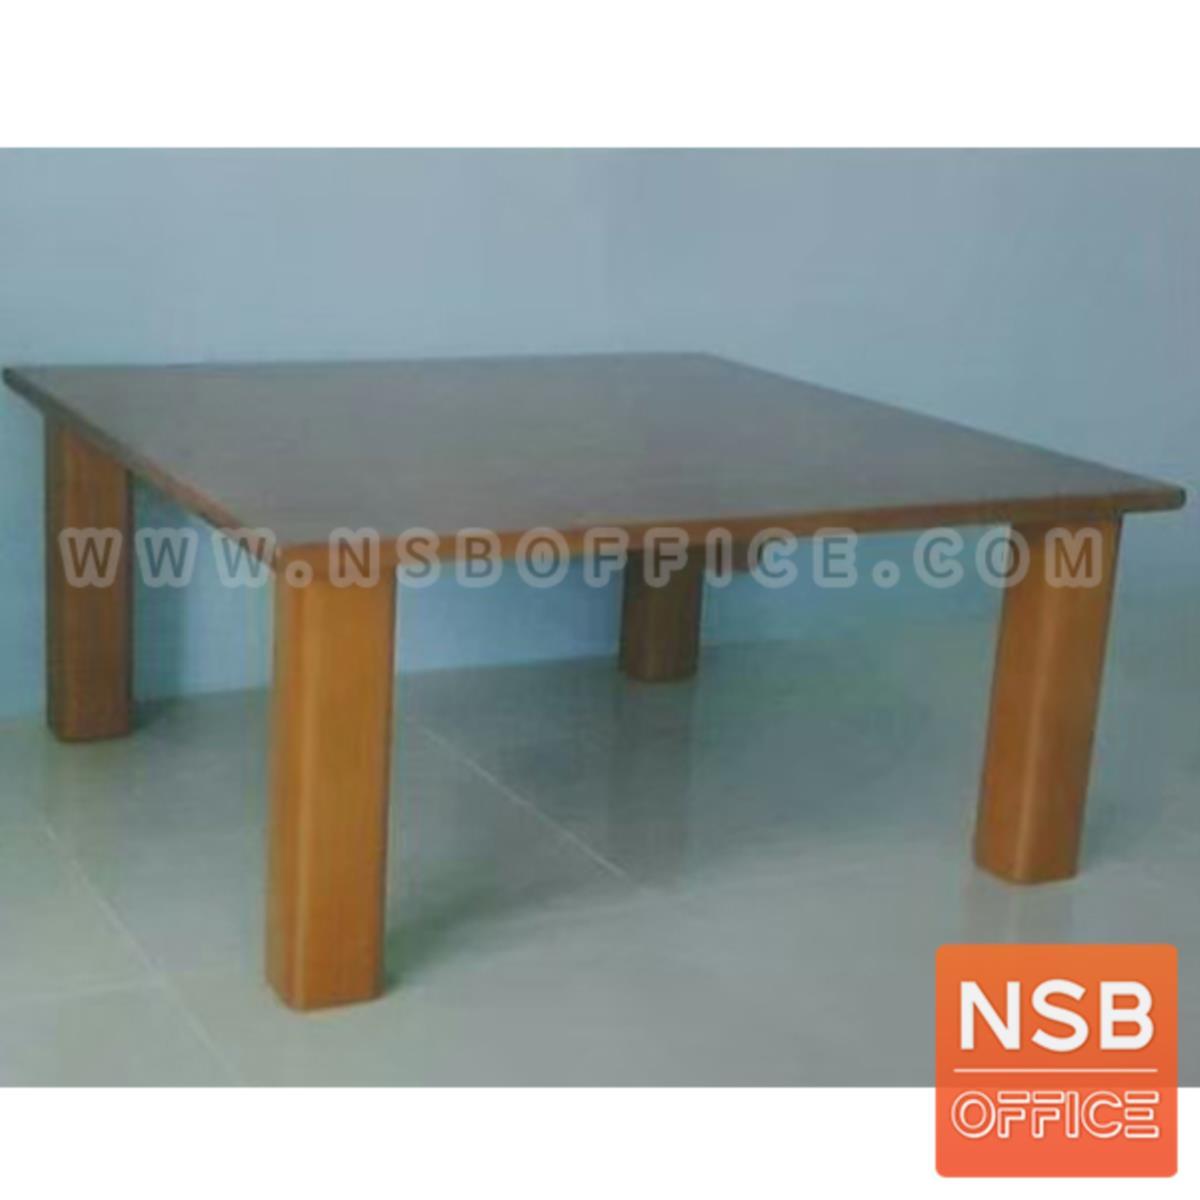 G20A013:โต๊ะกลางญี่ปุ่น รุ่น Cali (เคลี่) ขนาด 75Di*35H cm.